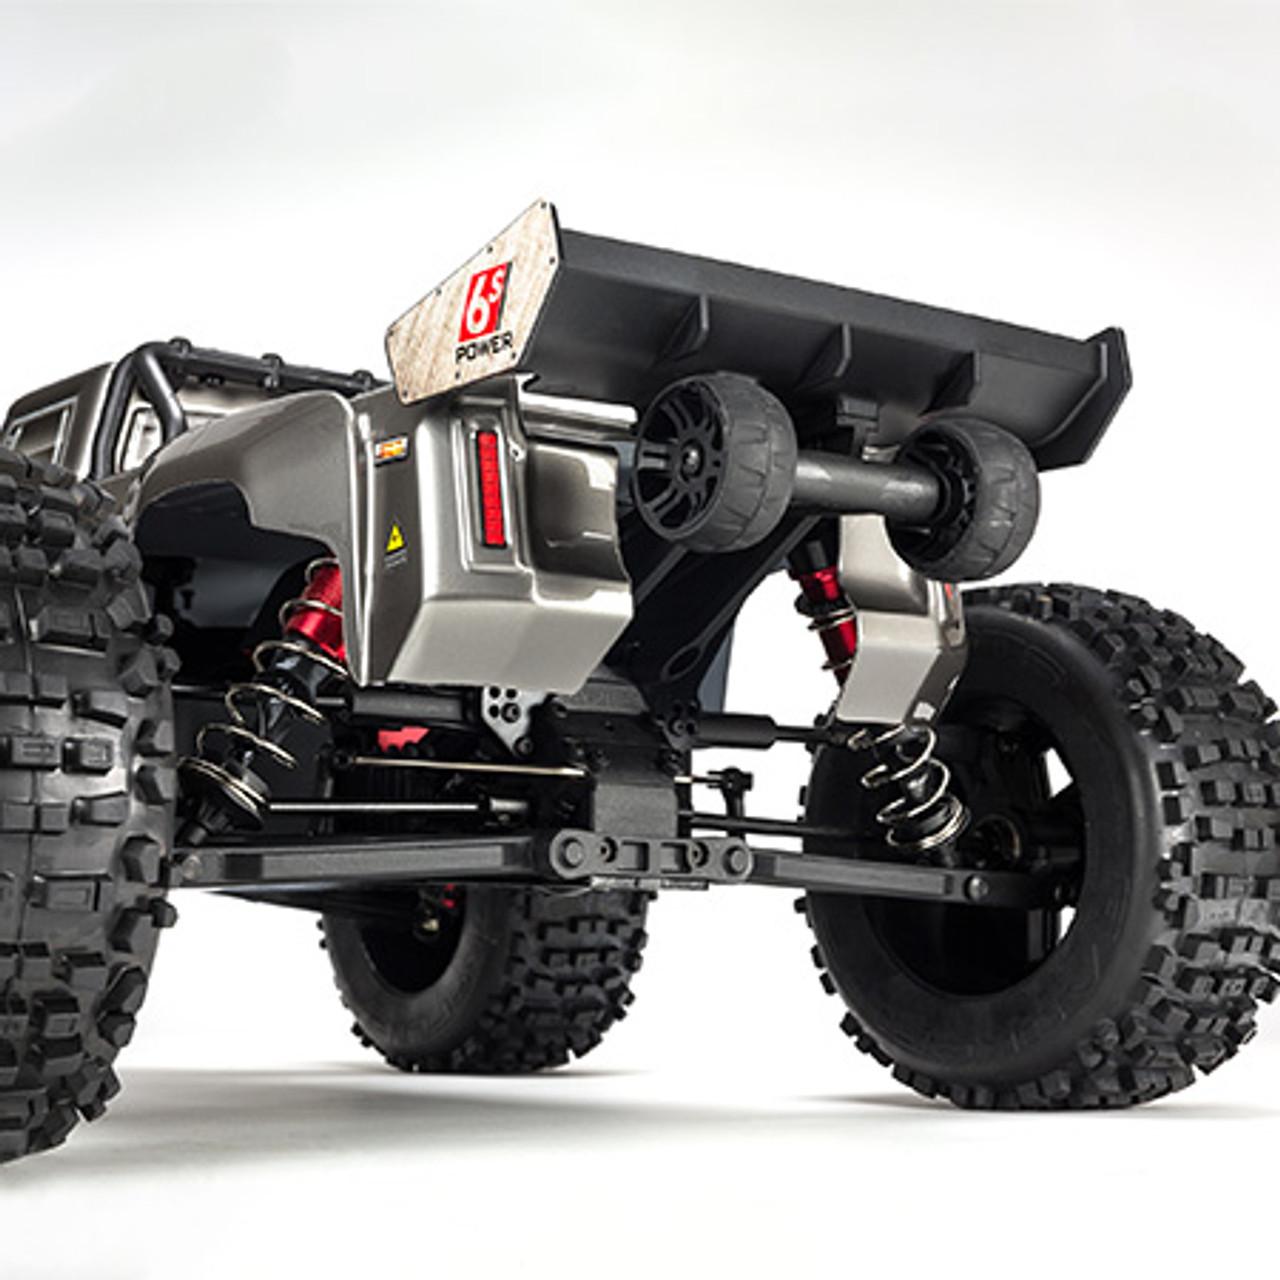 Arrma Outcast 6S BLX Brushless RTR Monster Stunt Truck (Silver)